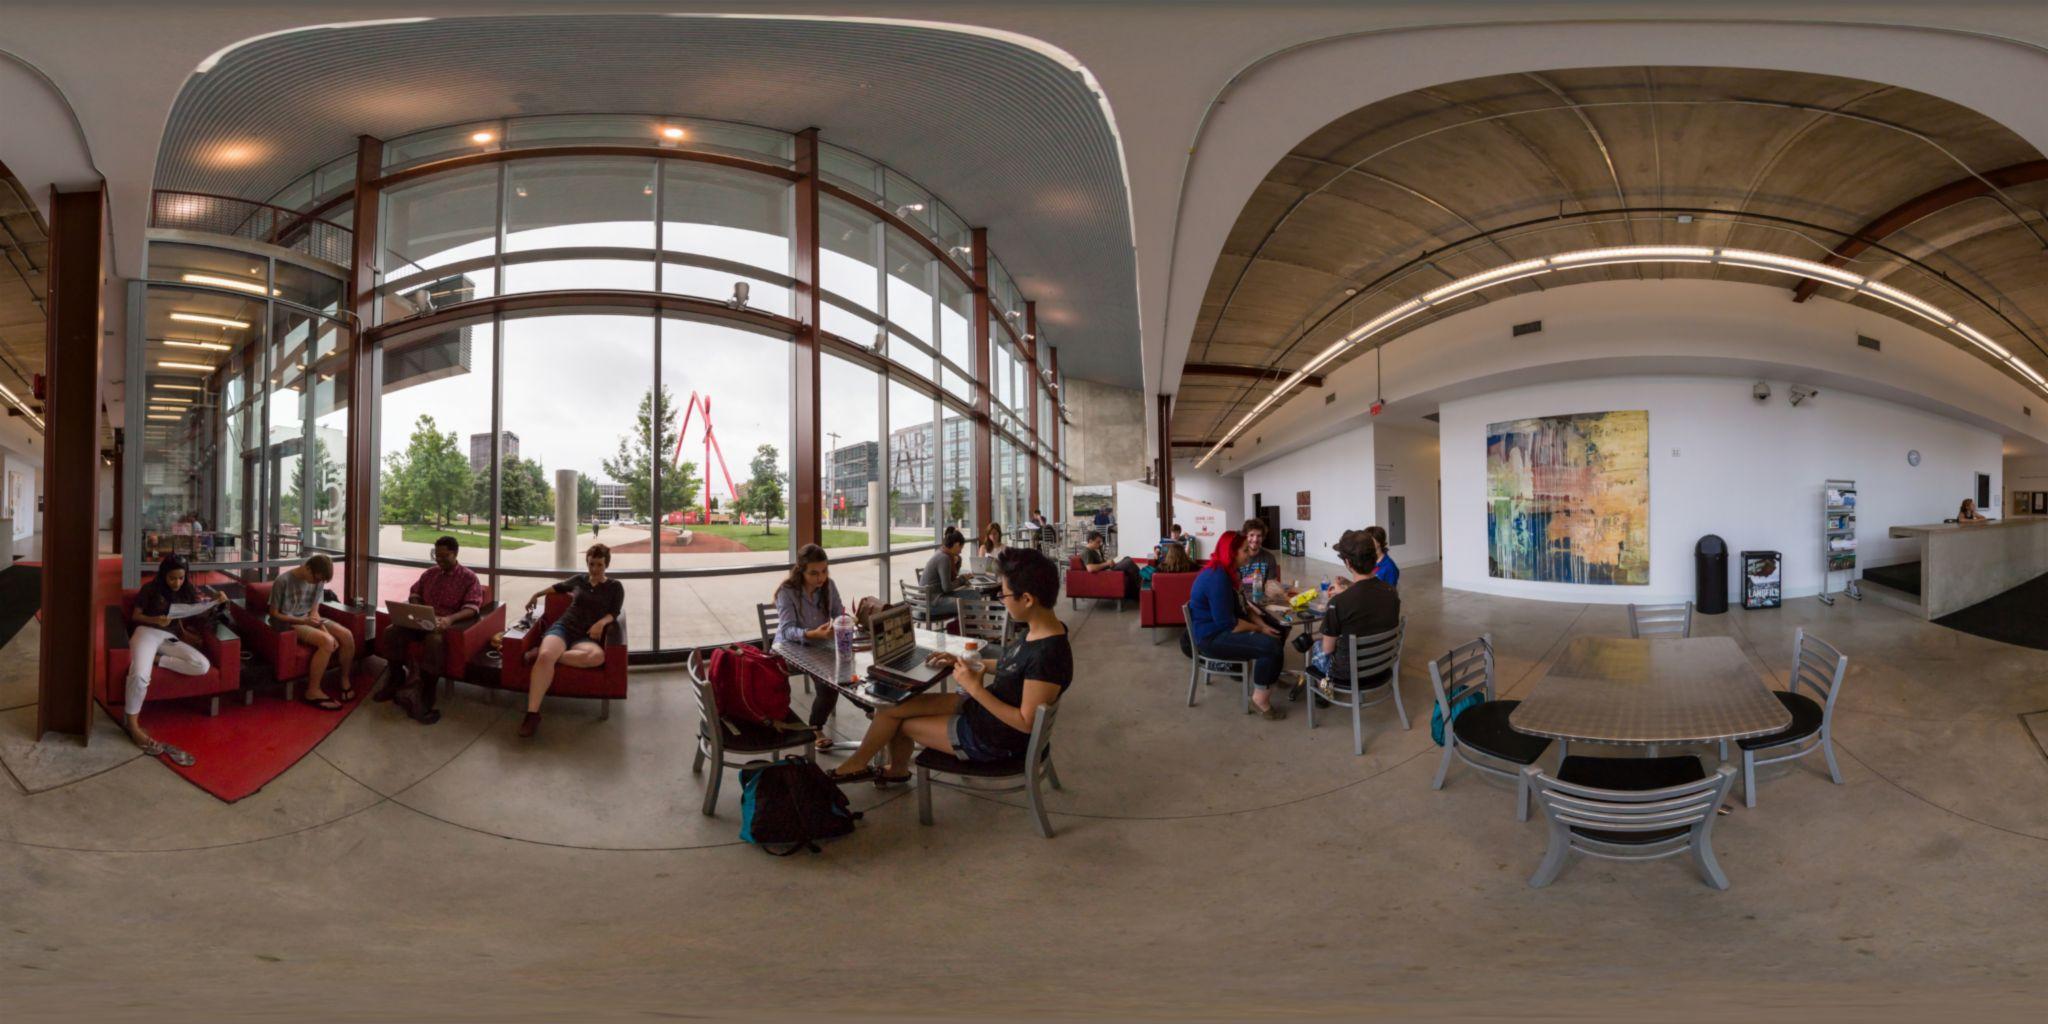 Interior design high school programs review home decor for The interior design institute online reviews